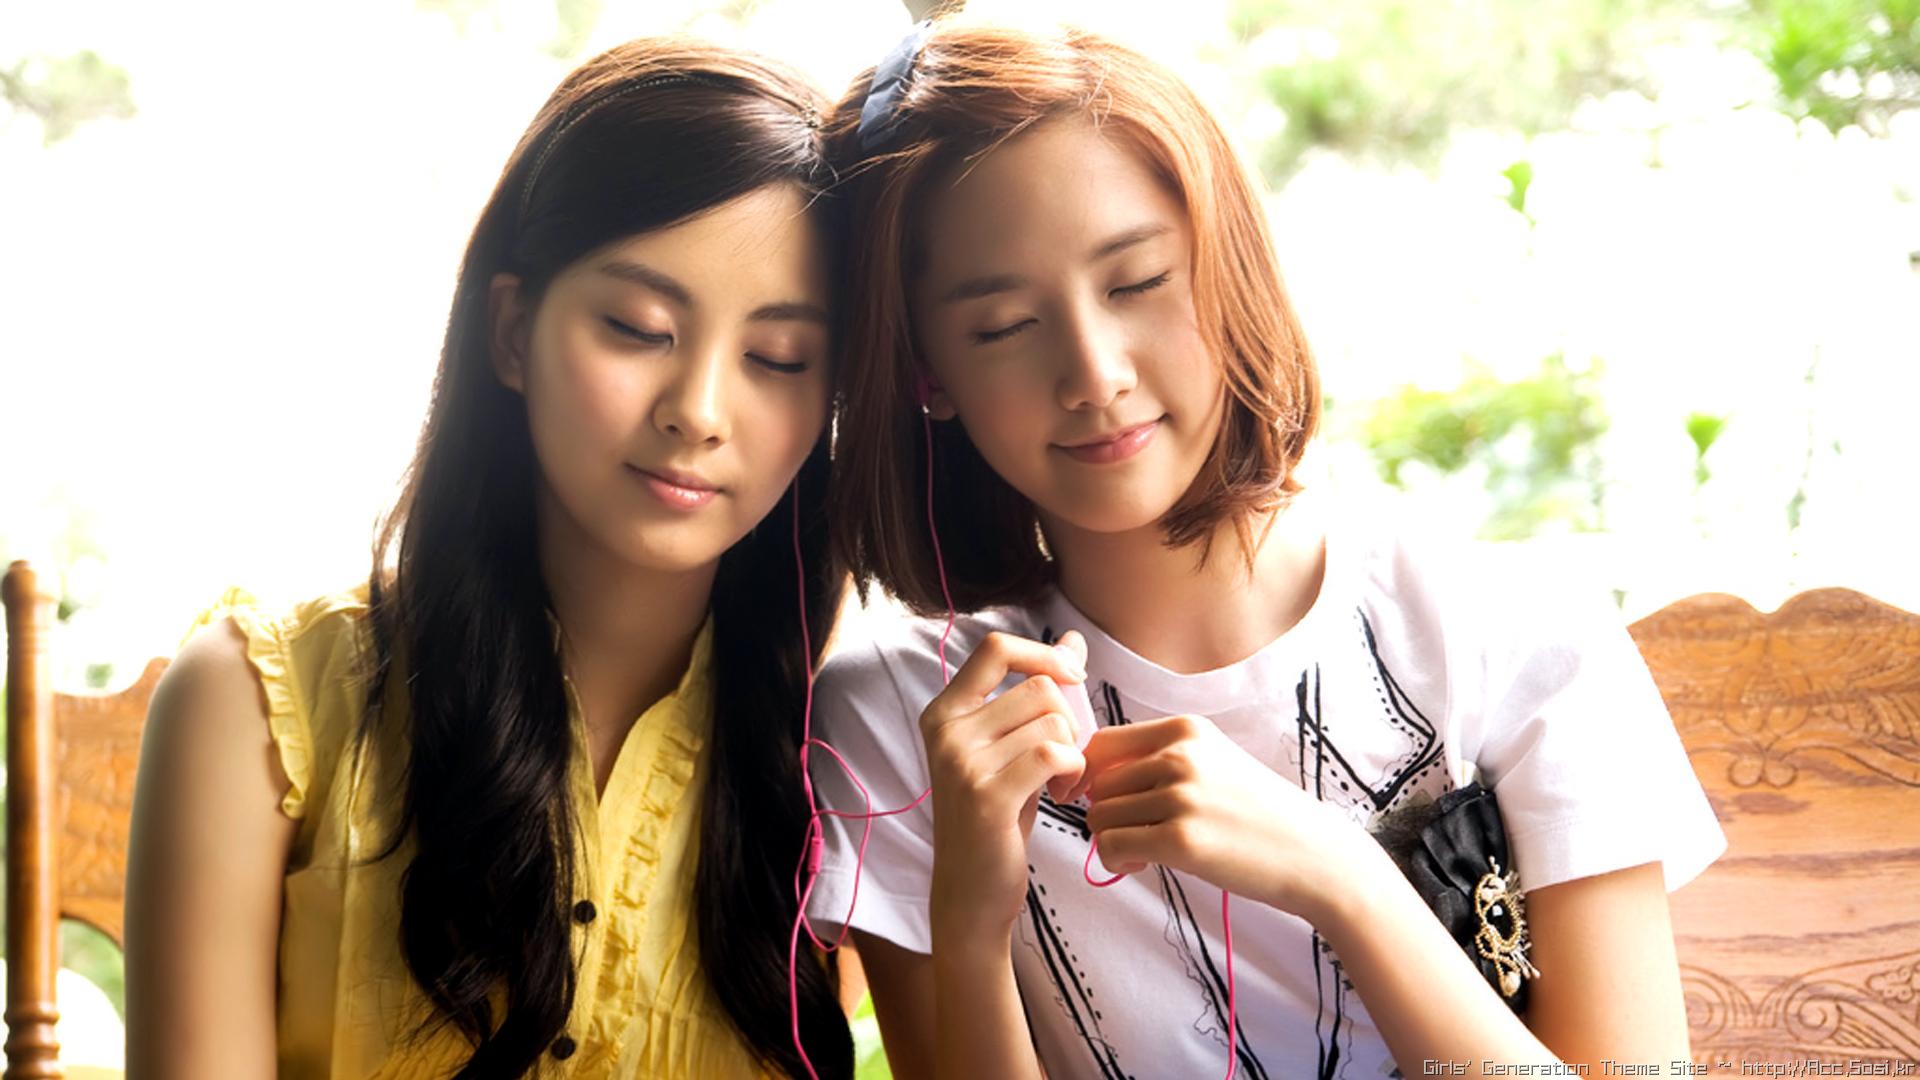 Seohyun Cute Wallpaper Women Girls Generation Snsd Seohyun Singers Im Yoona